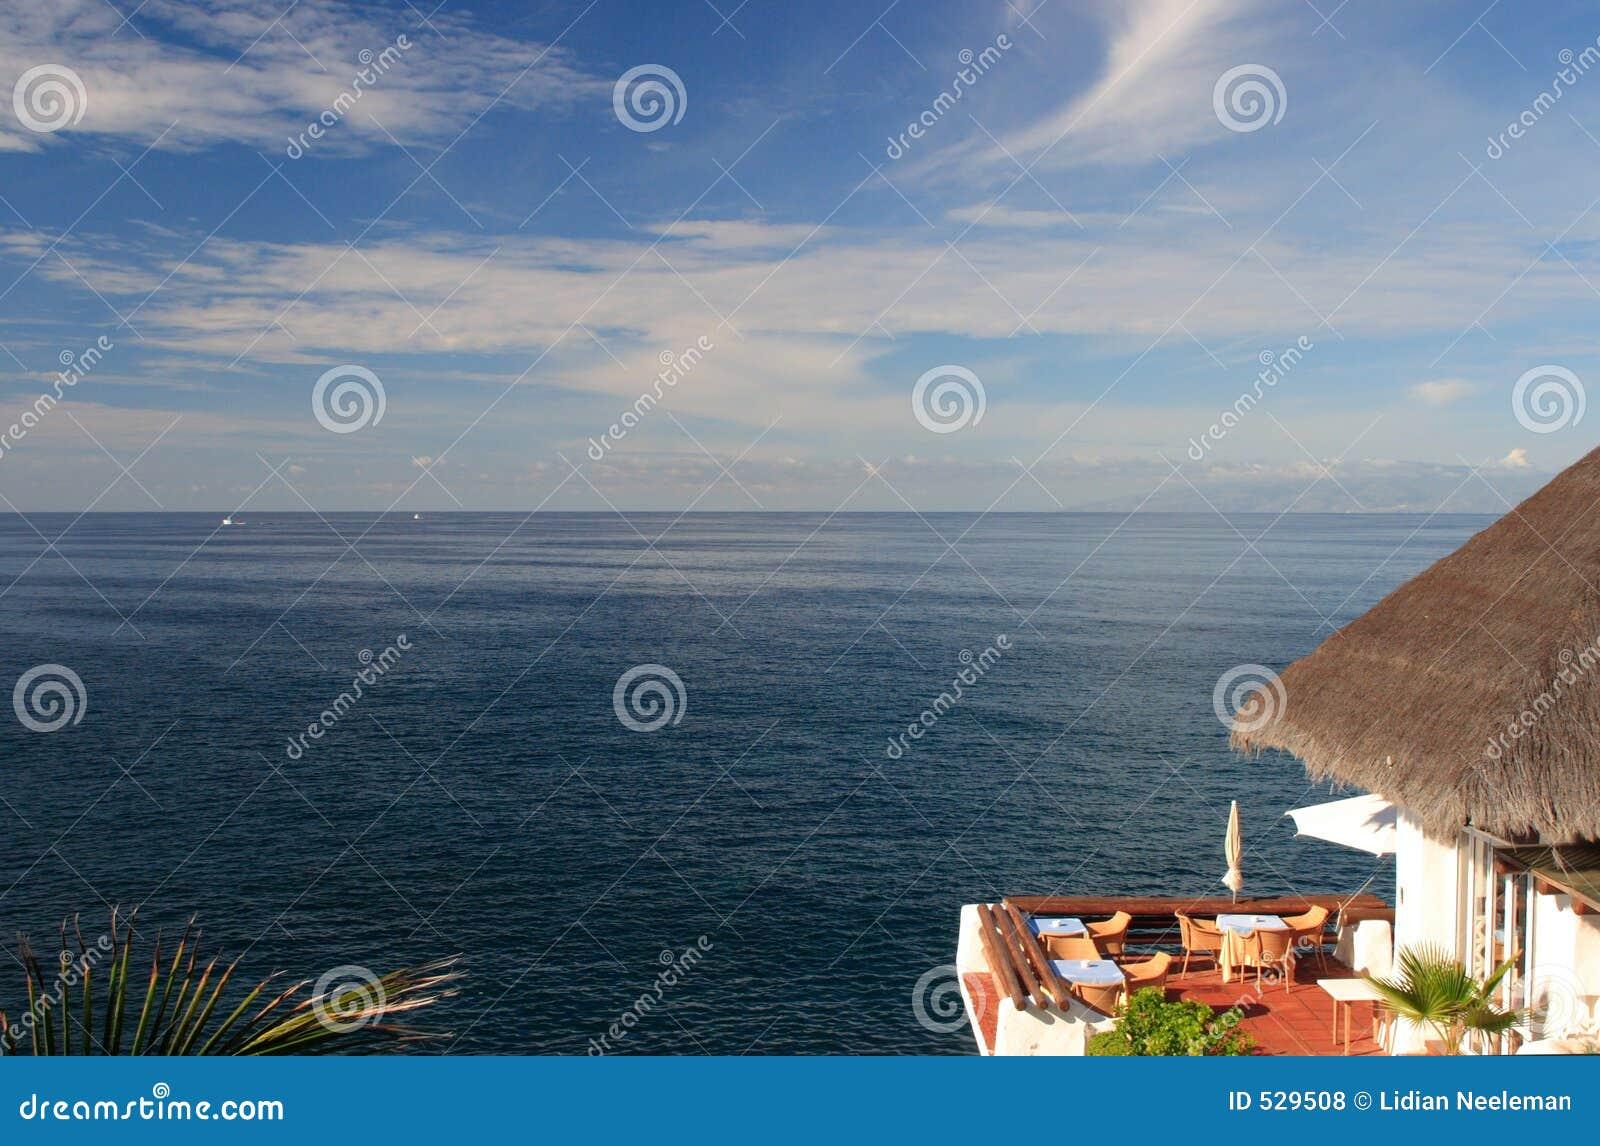 Download 海洋餐馆视图 库存照片. 图片 包括有 热带, 旅行, 视图, 西班牙, 吃饭的客人, 烹饪, 海岸线, 海运 - 529508